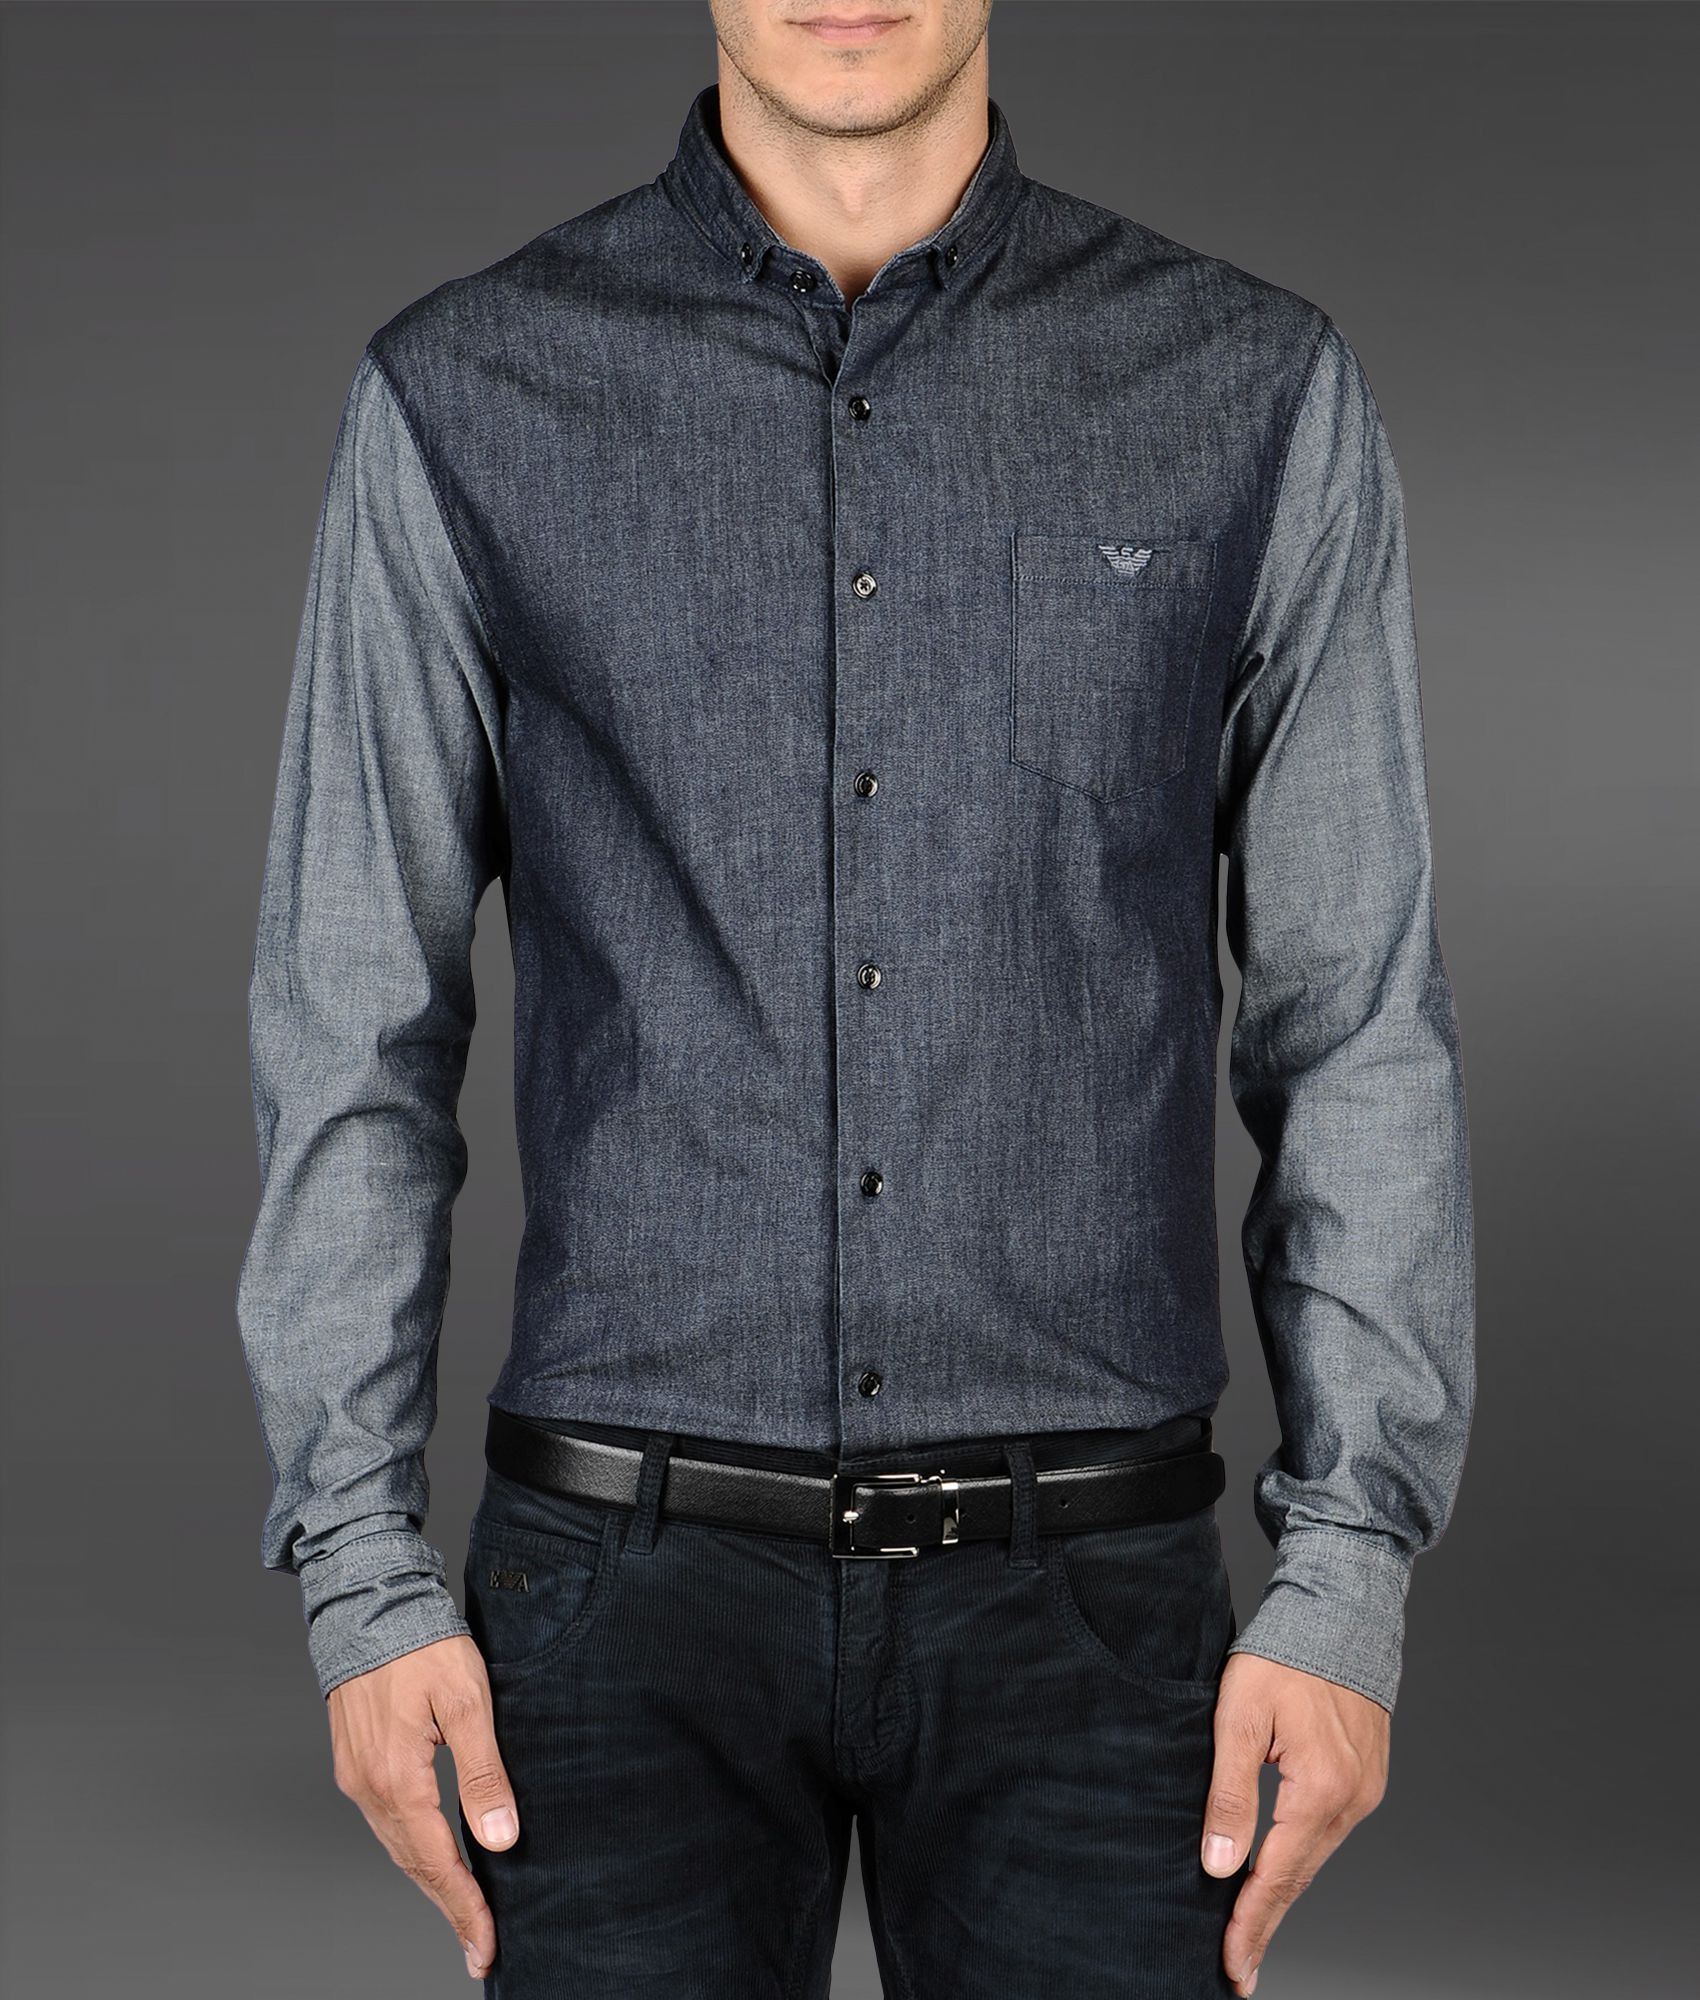 lyst emporio armani shirt in denim effect cotton in blue